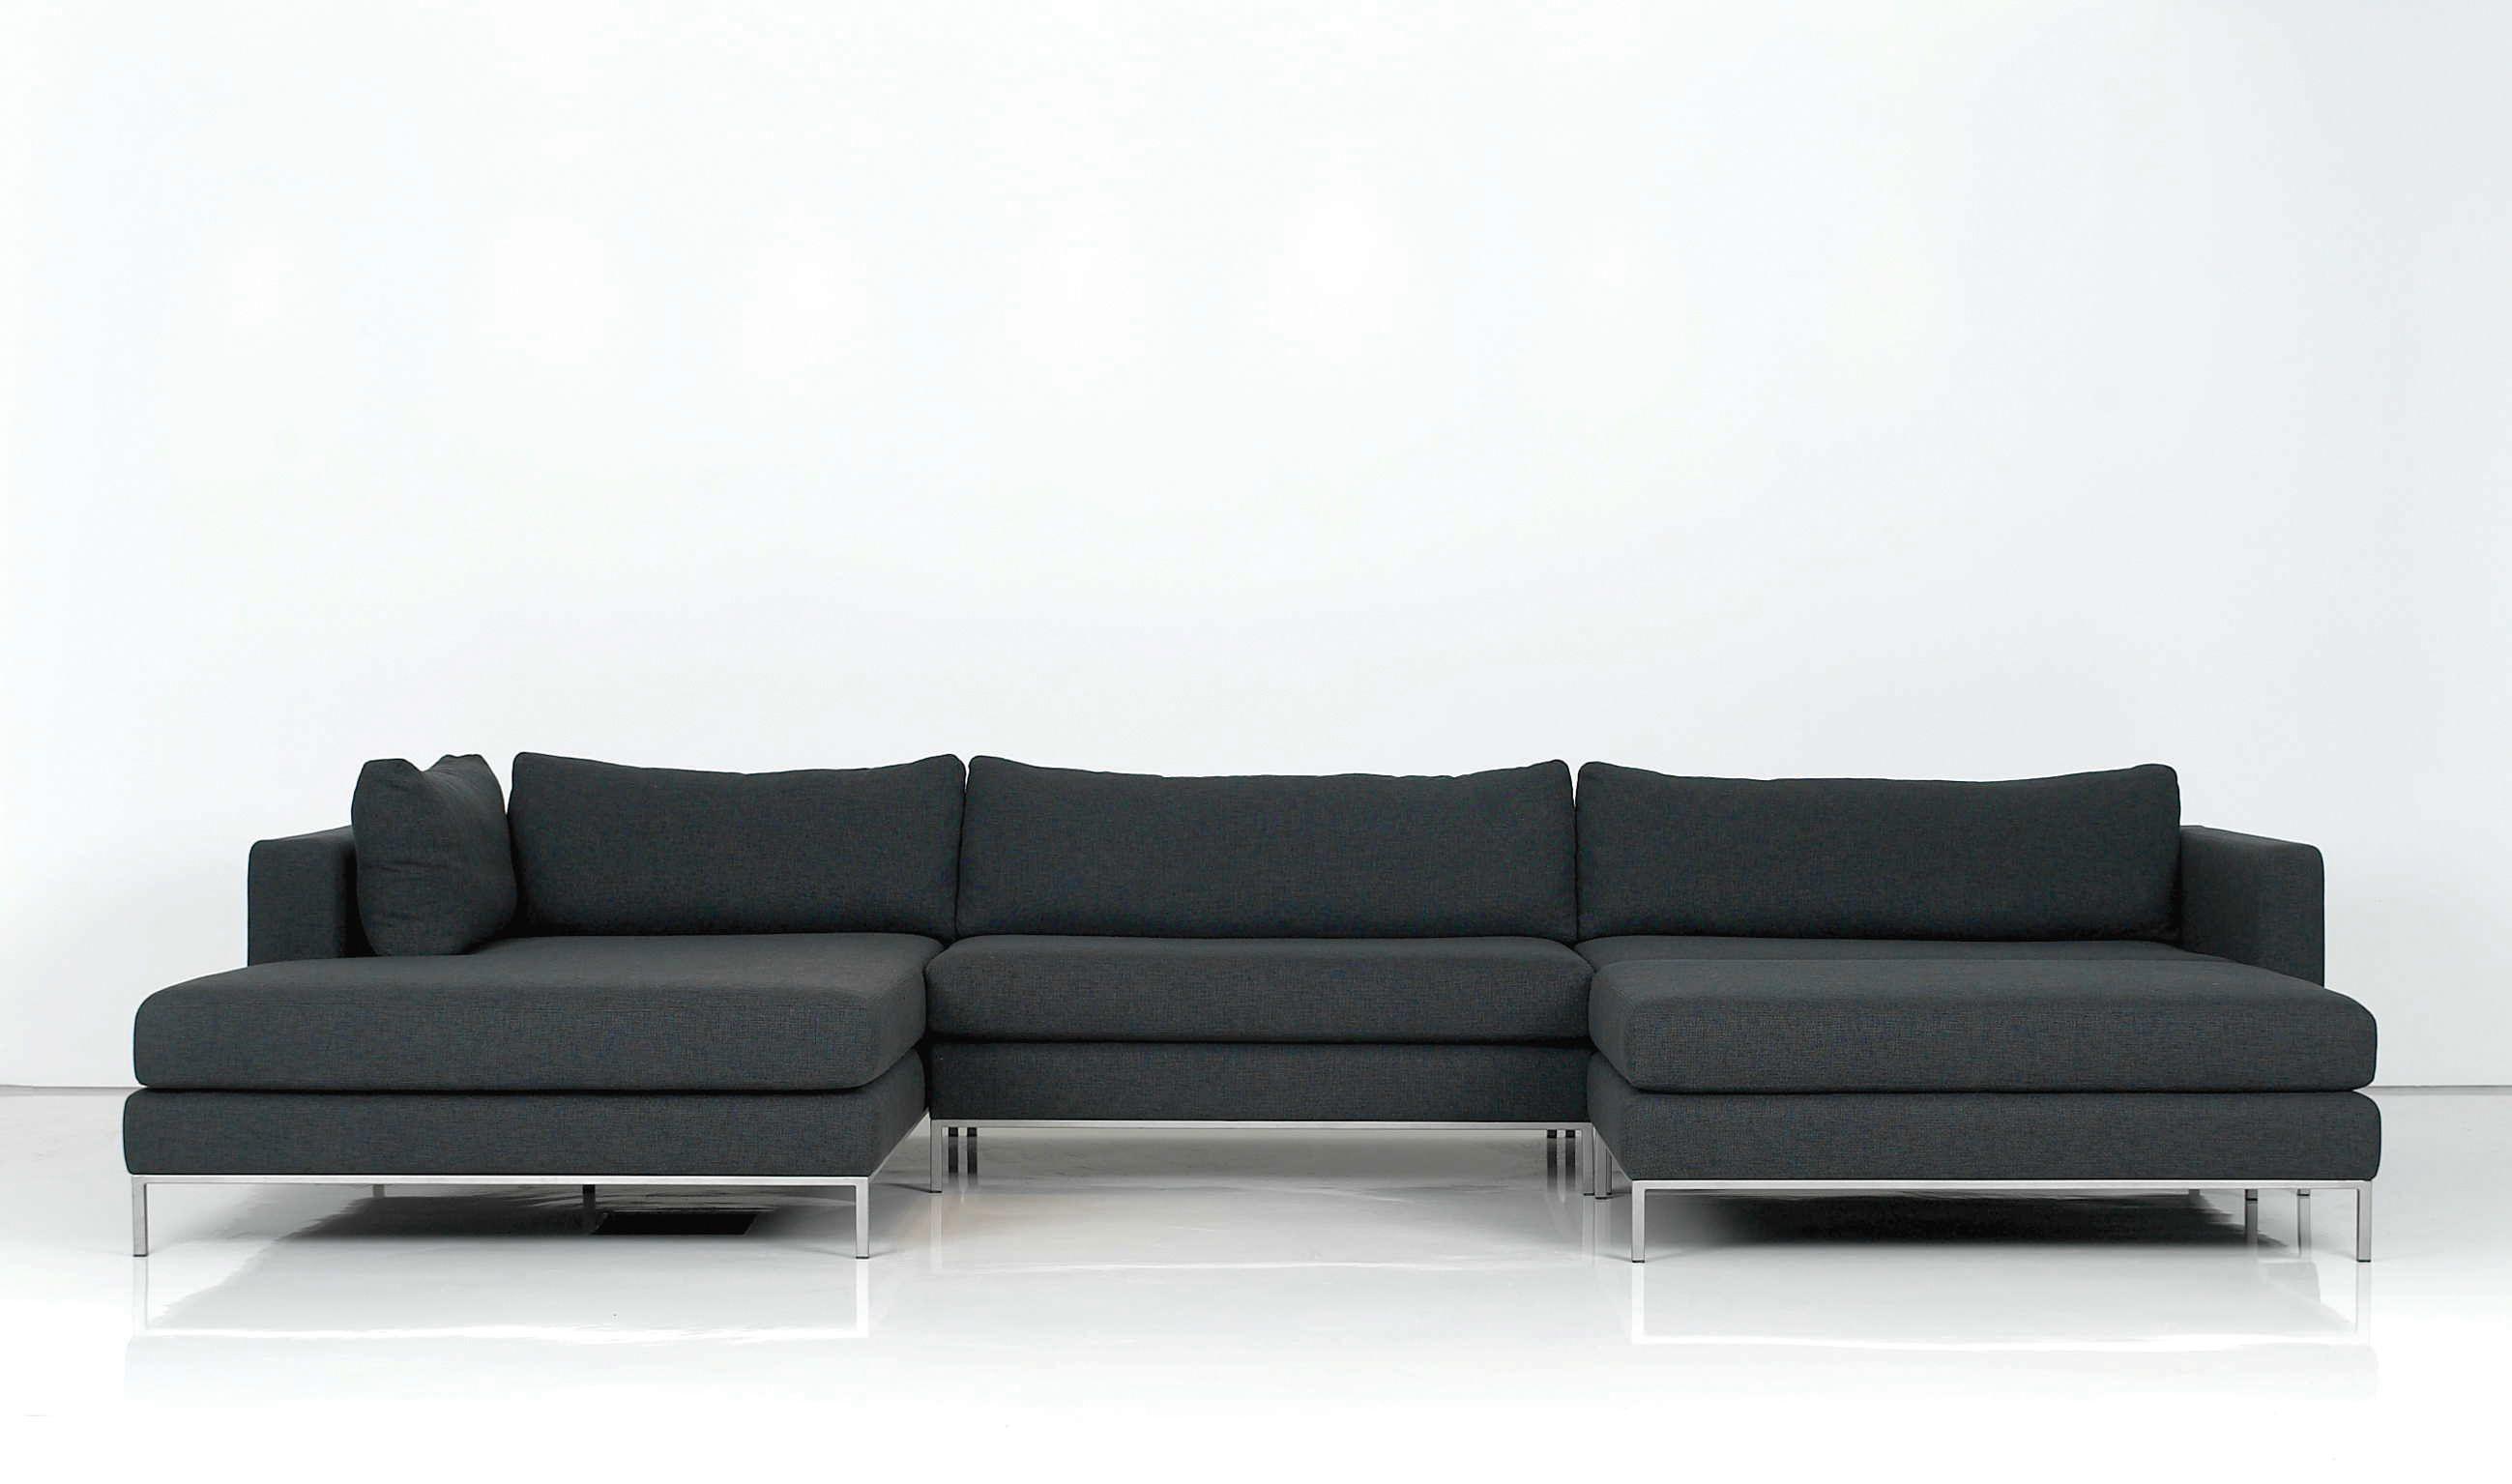 Interni Edition Anvers Contemporary Furniture Sofa